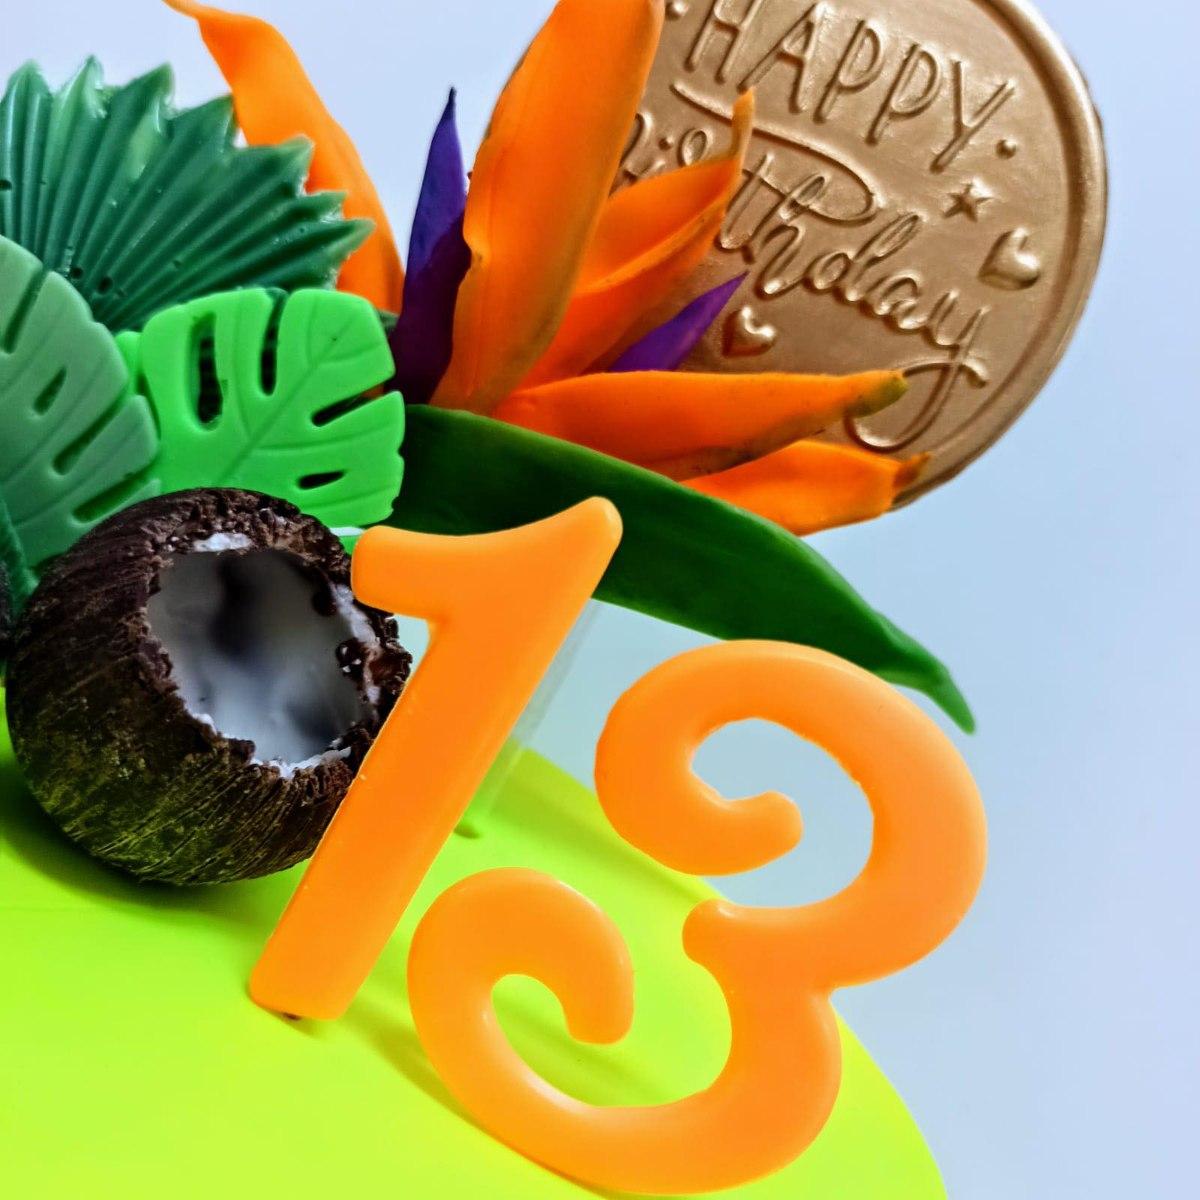 HAPPY BIRTHDAY תבנית טופר עם כיתוב | טופר לעוגת אהבה יום הולדת | חדש מאתי דבש 2021